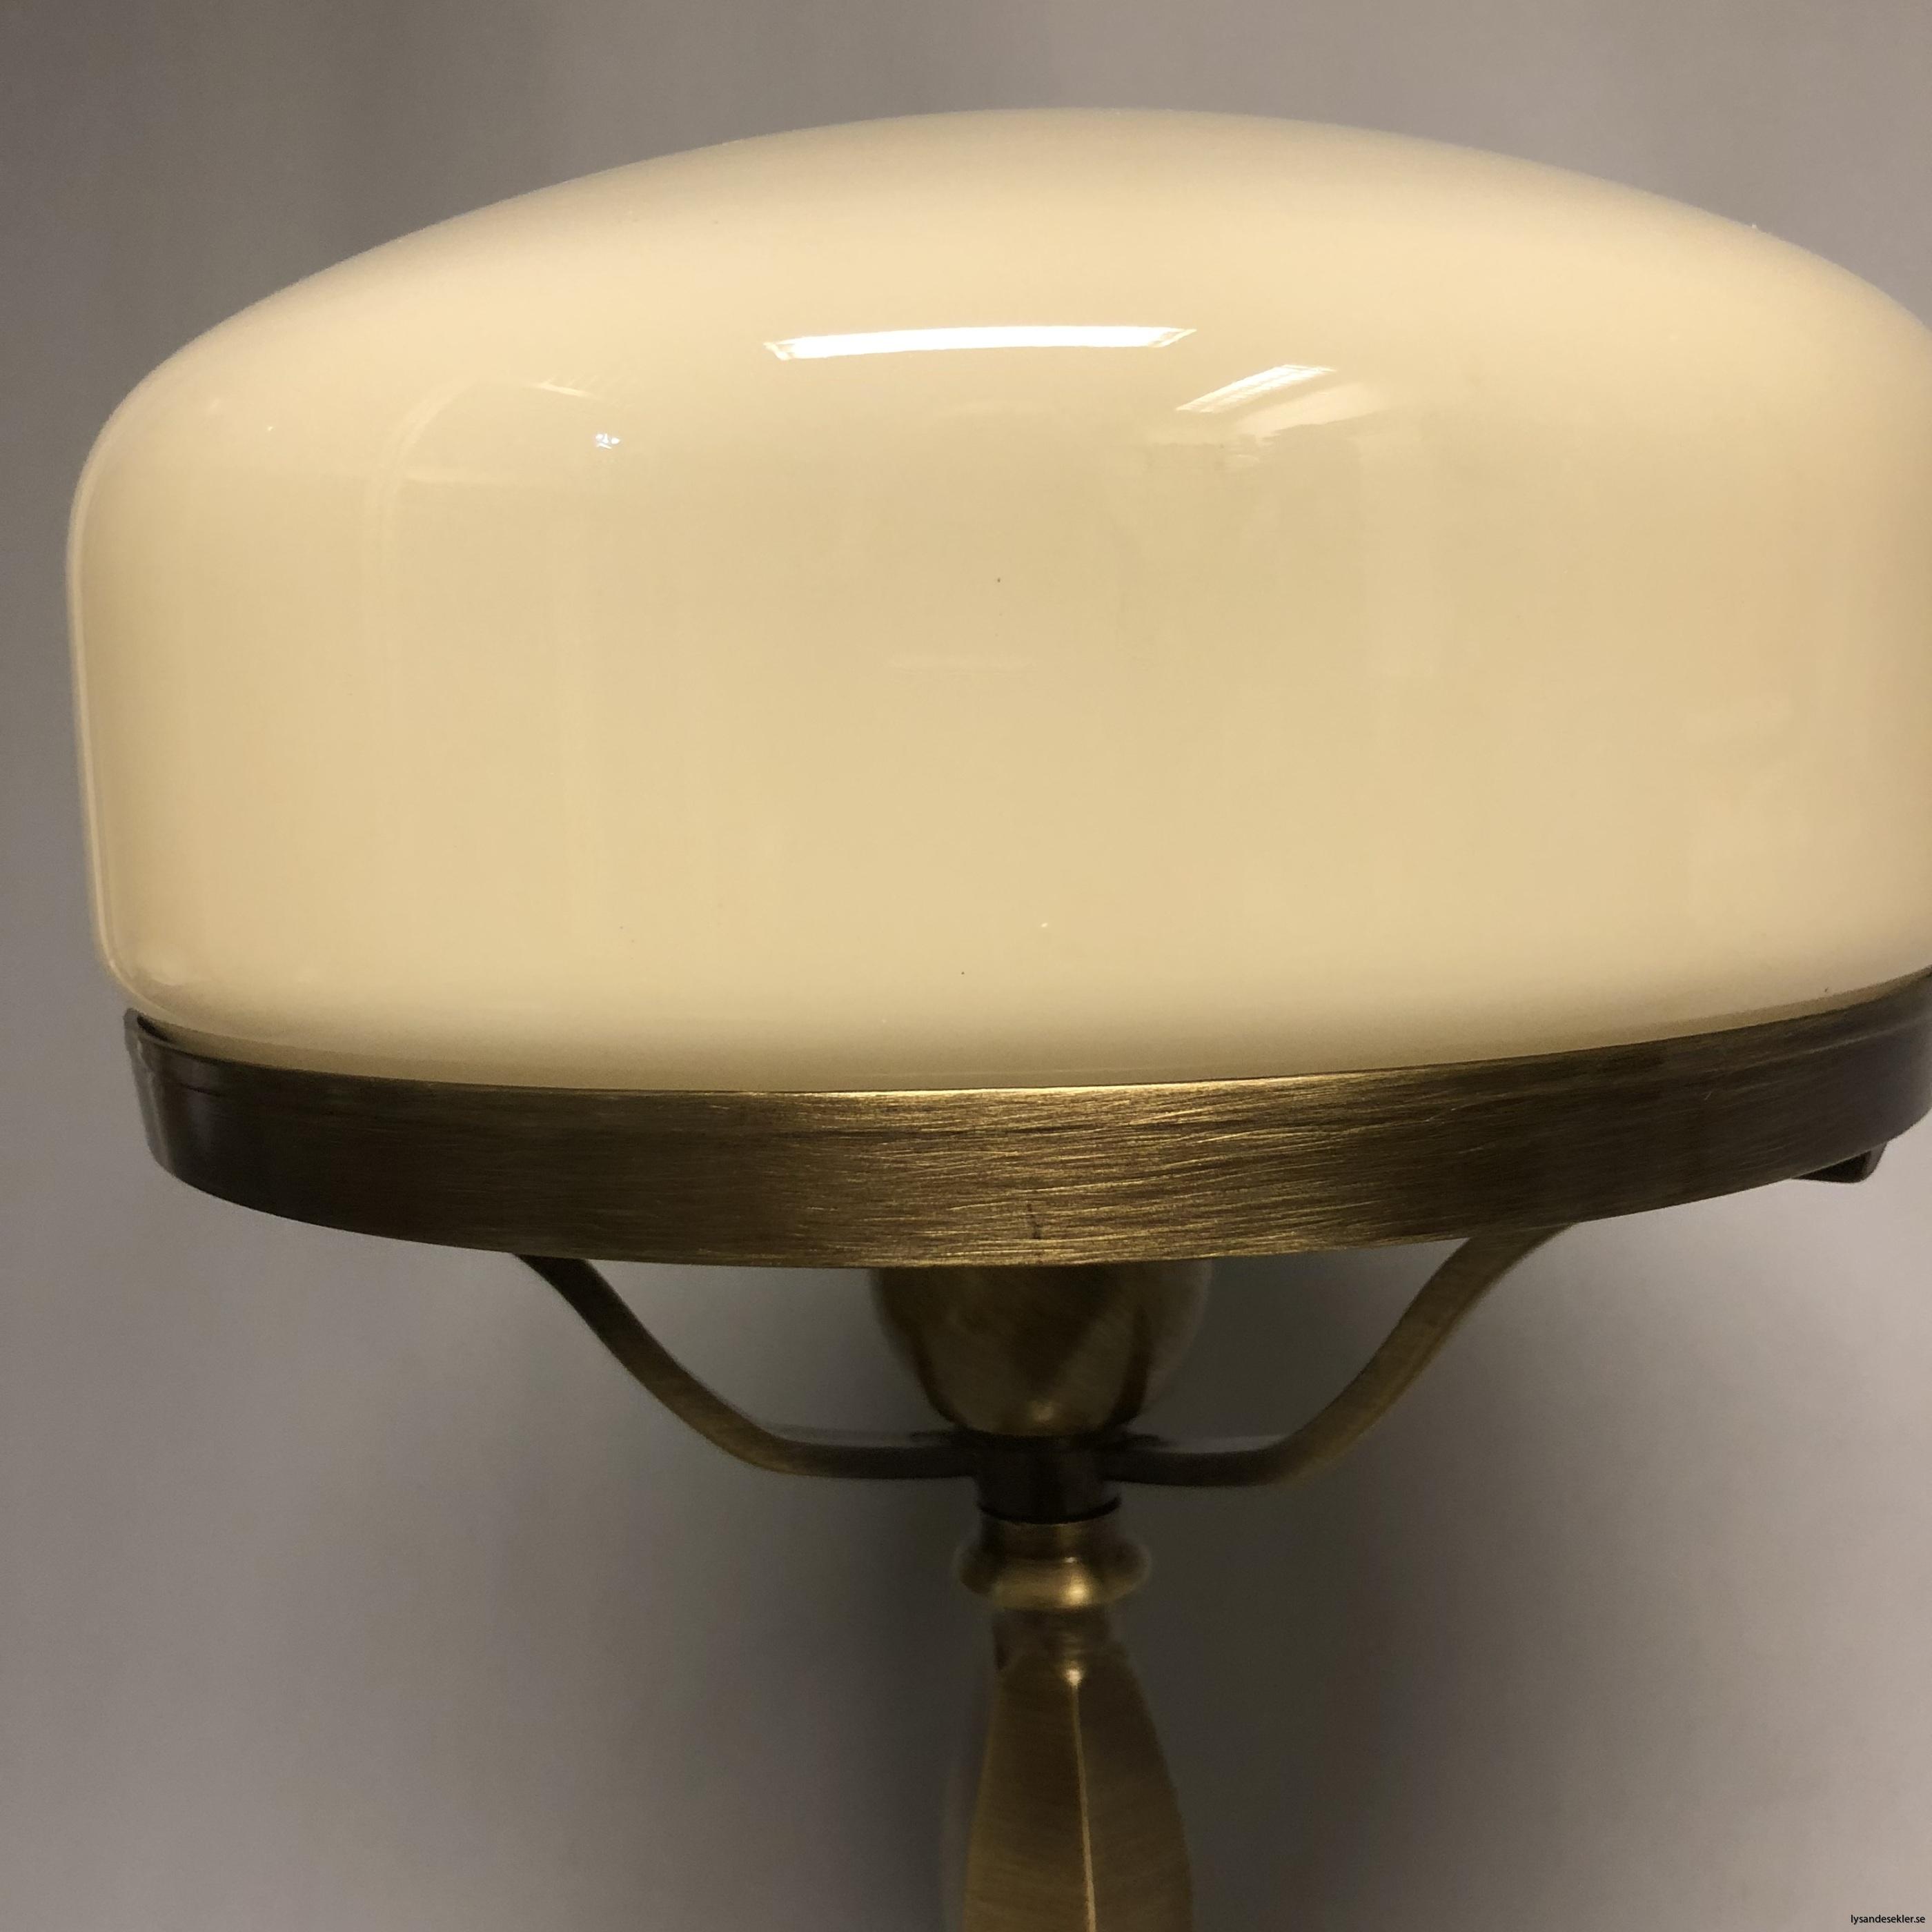 strindbergslampa strindbergslampor strindberg lampa skärm kupa strindbergsskärm strindbergskupa45